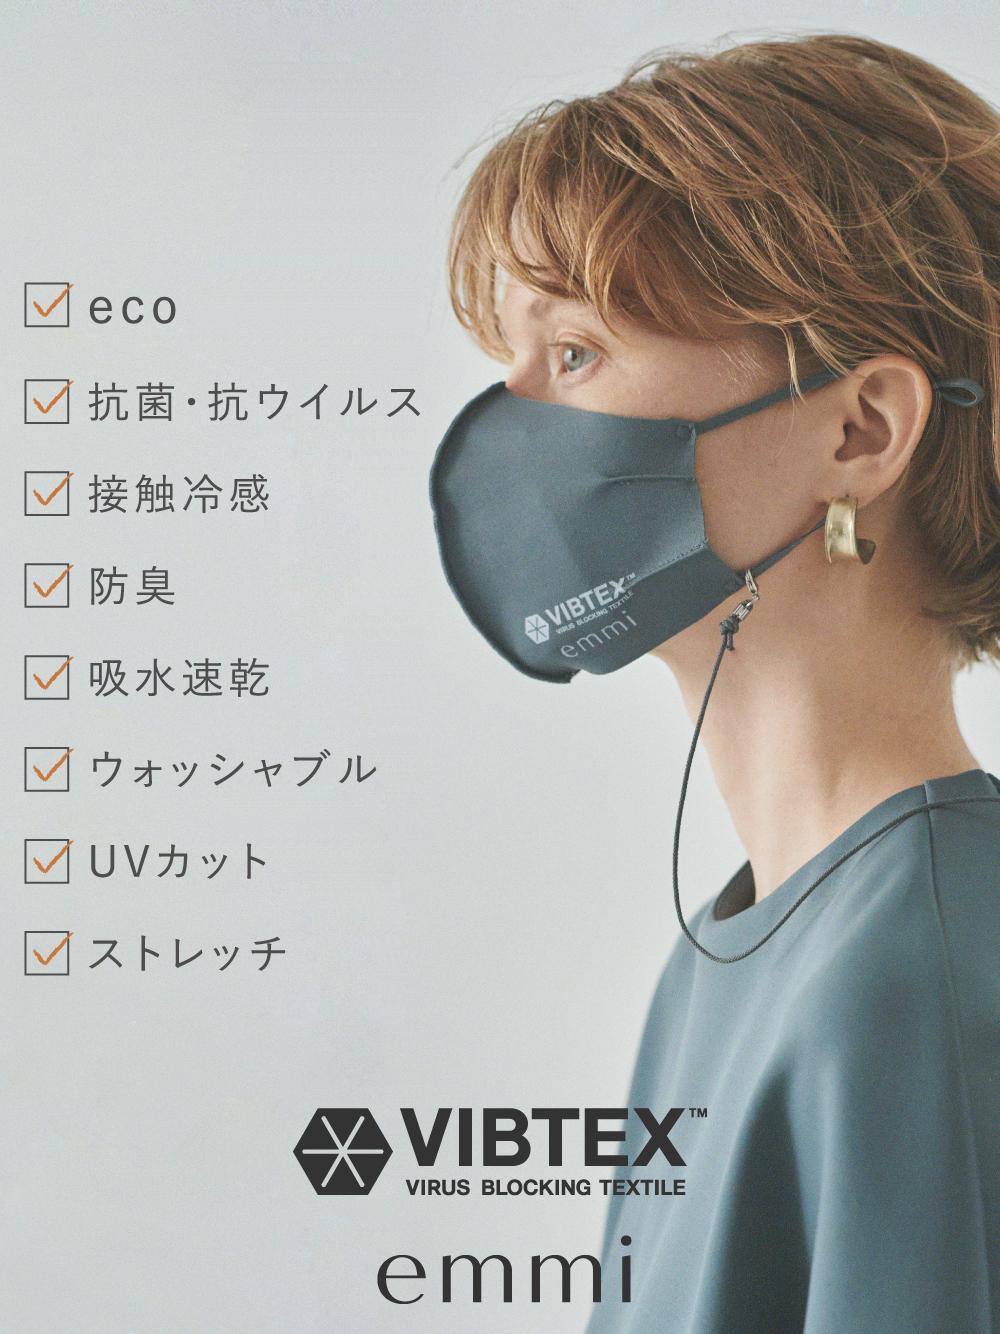 【emmi yoga】VIBTEX マスクアジャスター付き(GRY-F)